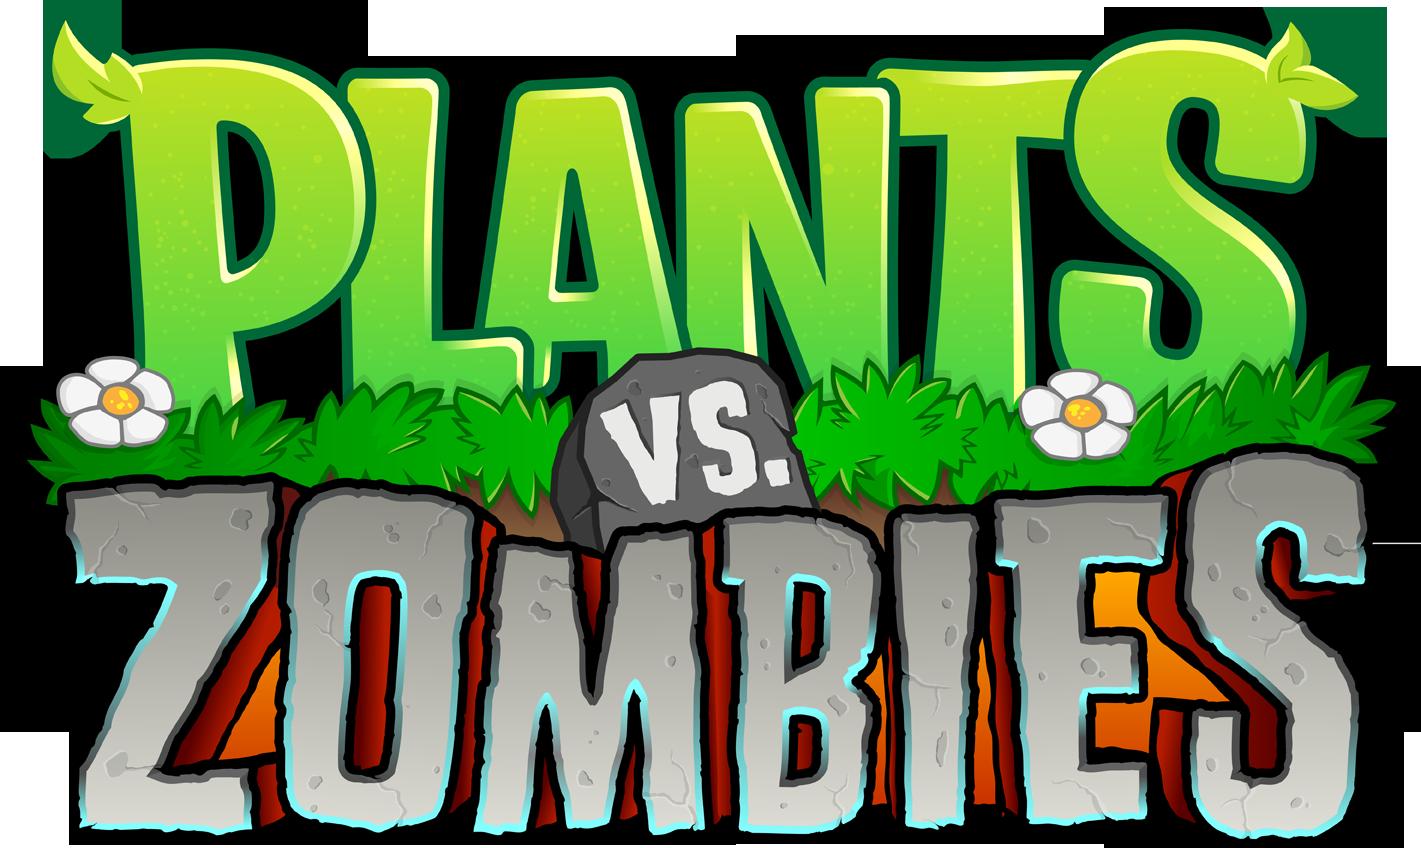 Zombie clipart grave. Plants vs zombies crossover